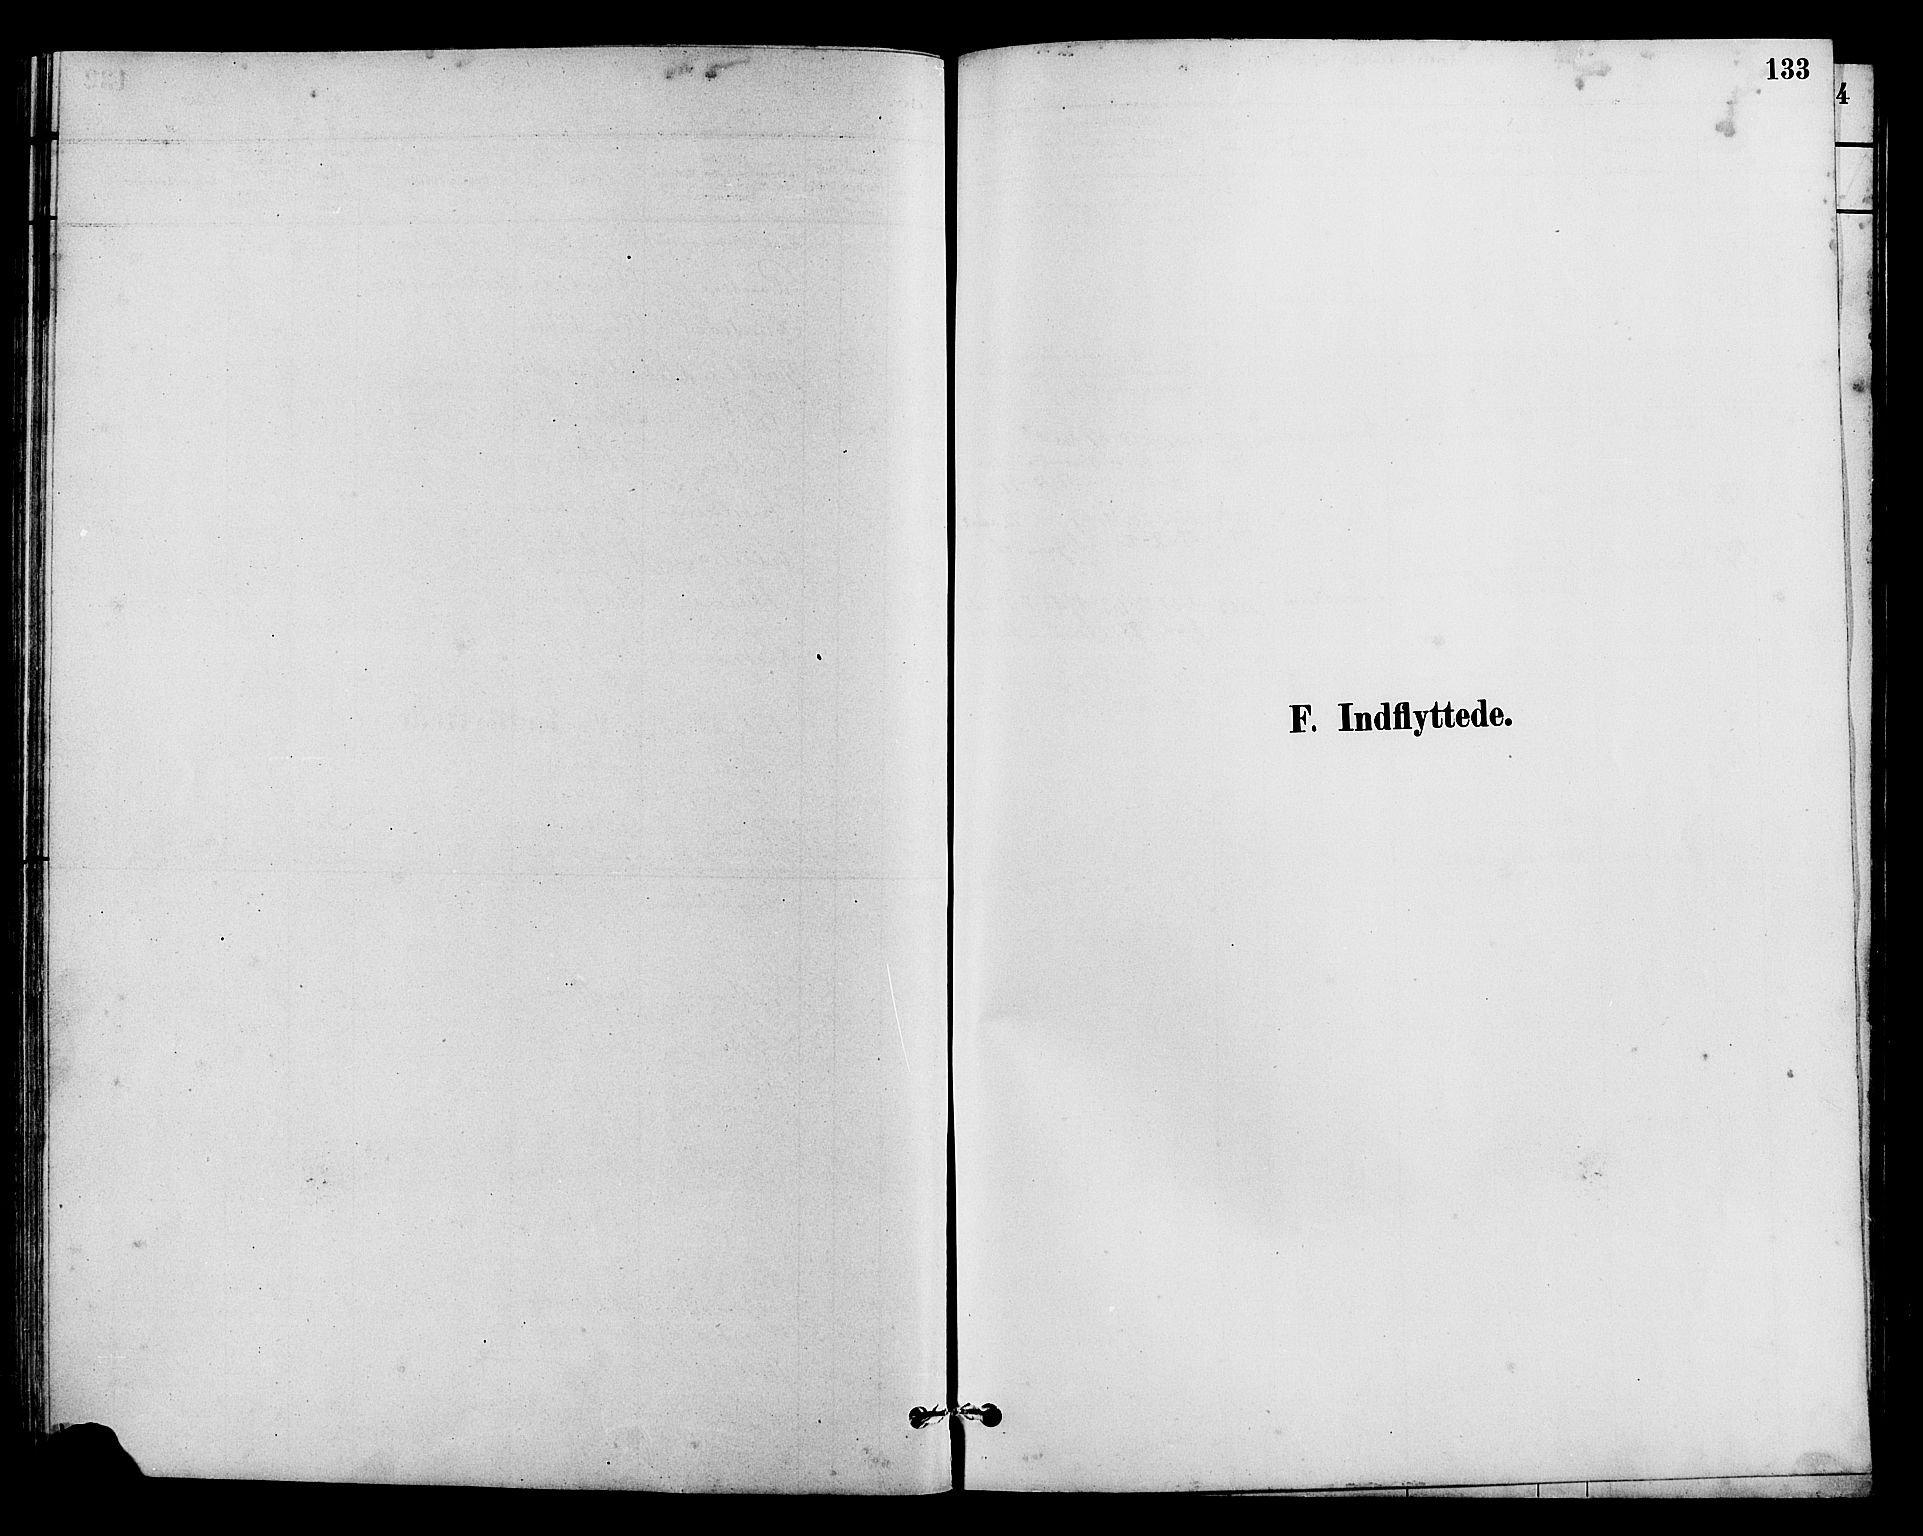 SAH, Vestre Slidre prestekontor, Klokkerbok nr. 5, 1881-1913, s. 133